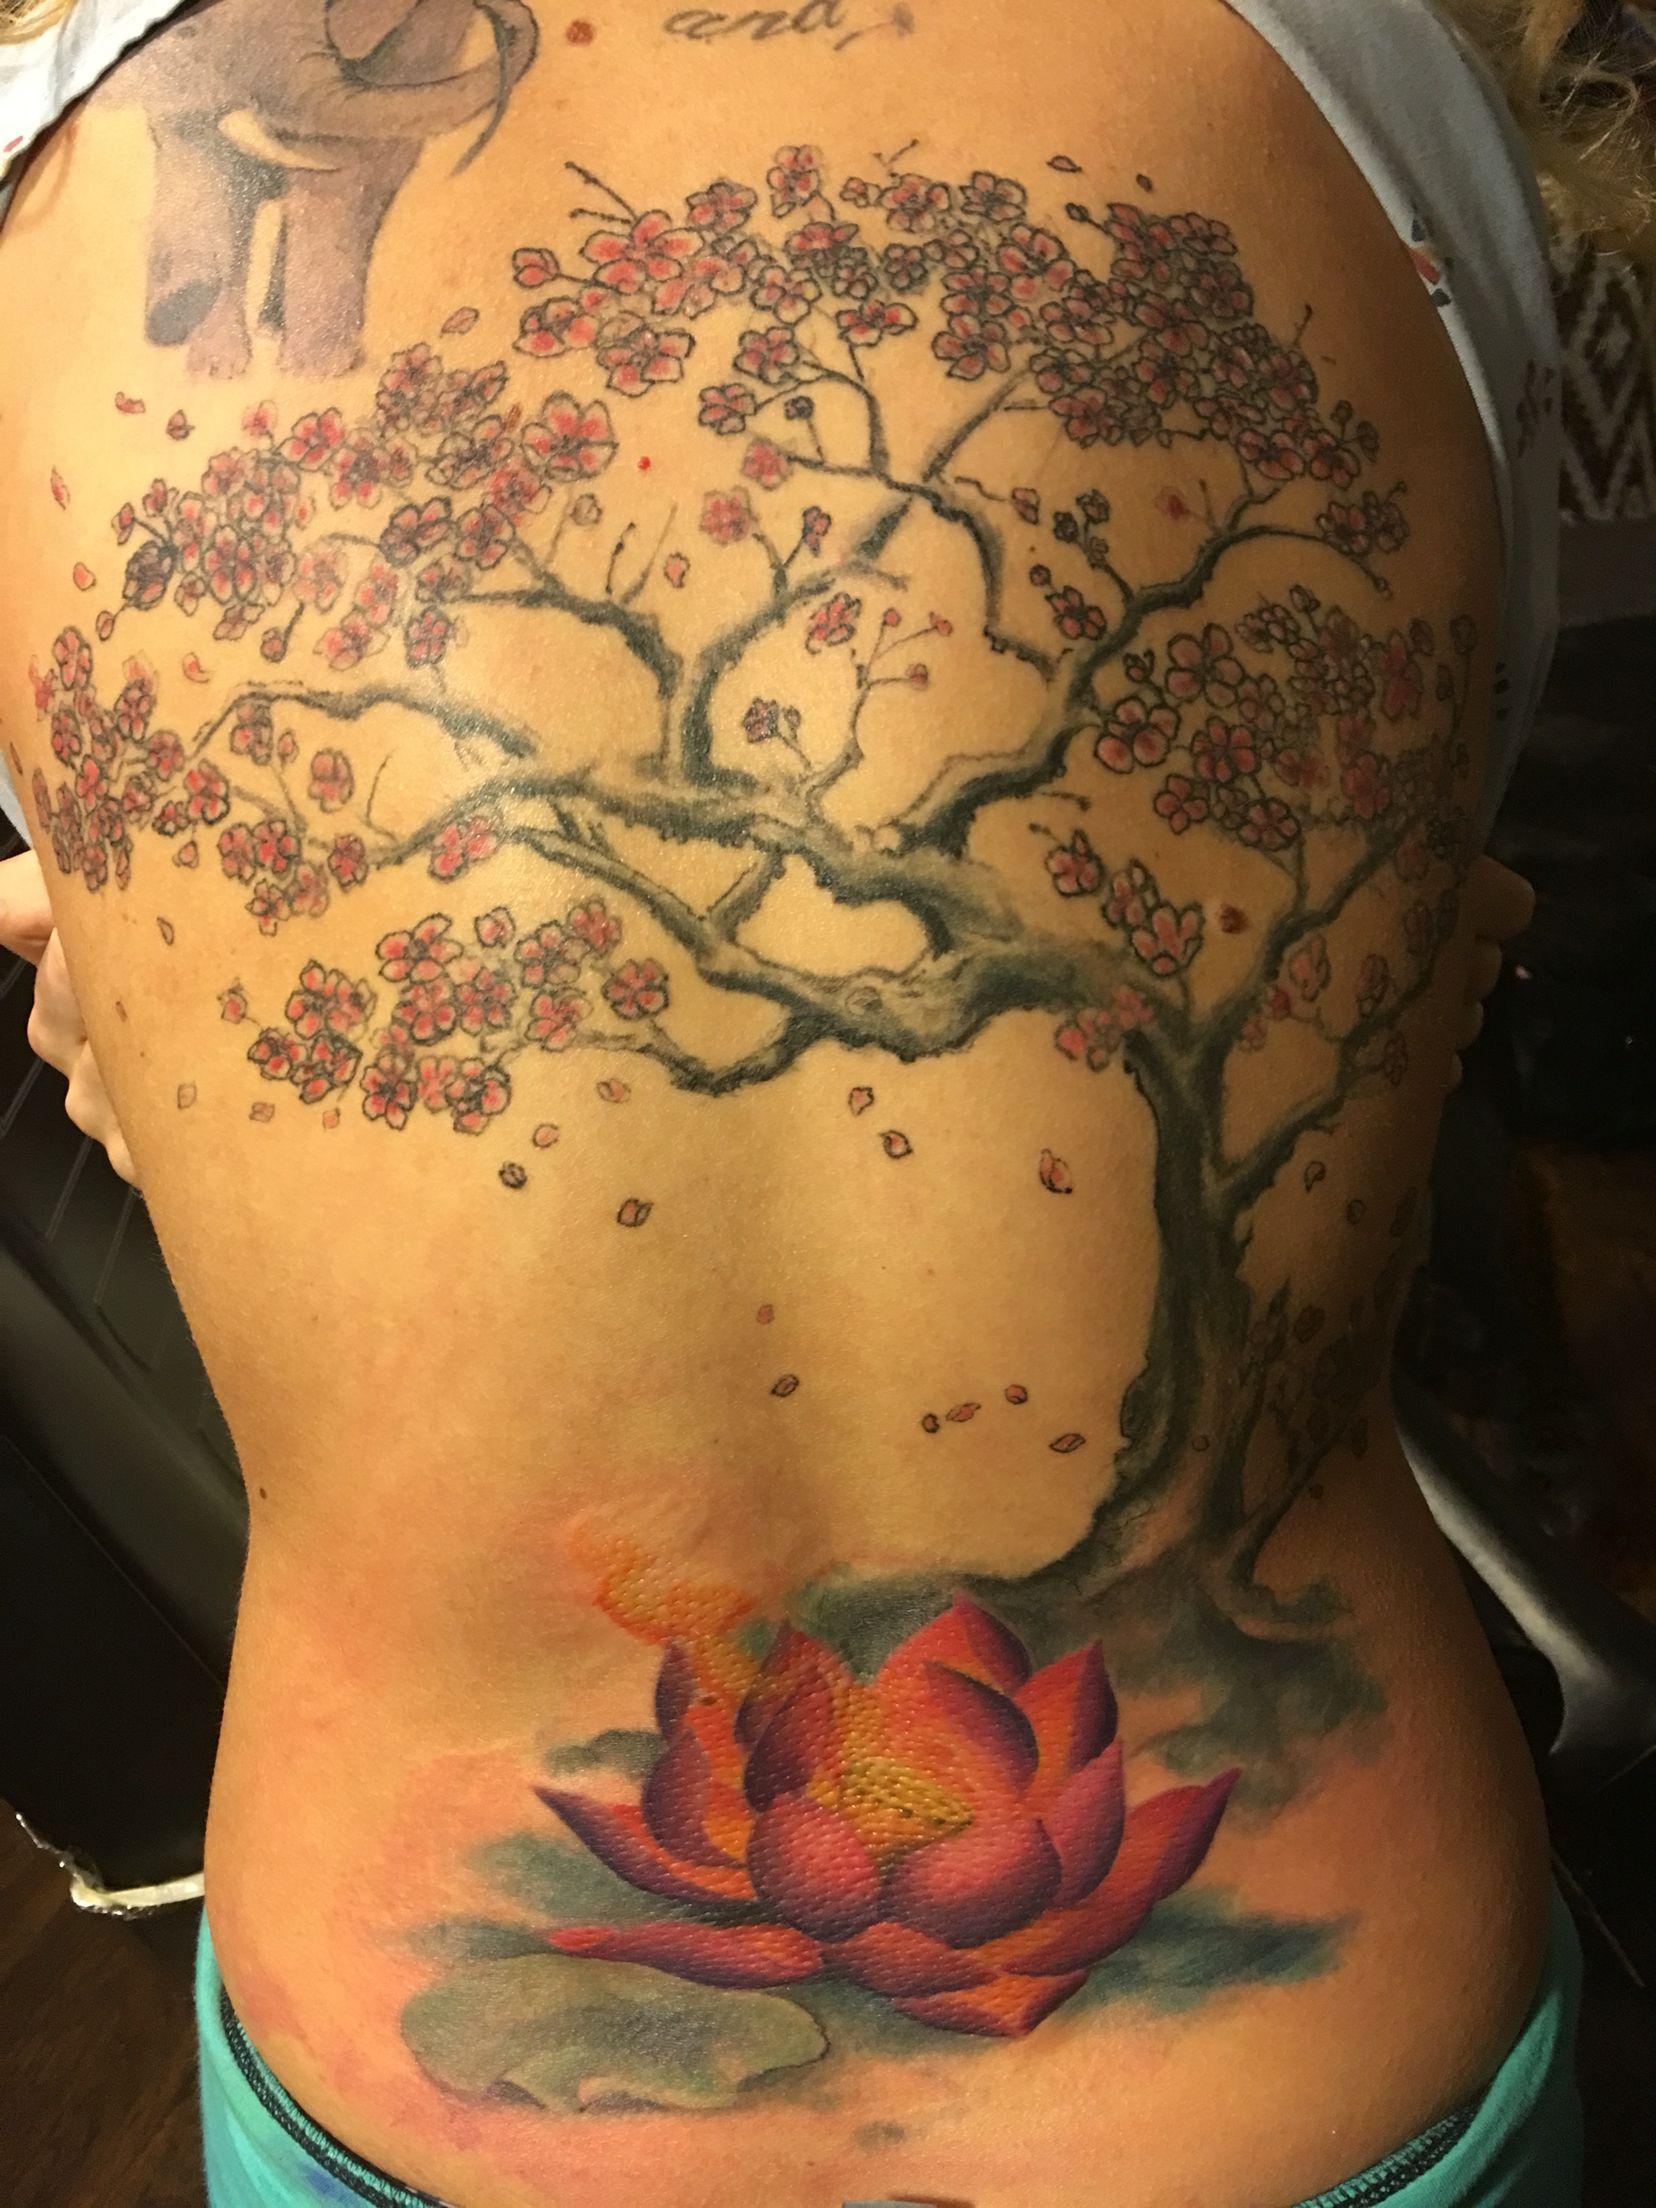 Watercolor Tattoo Flower Tattoo Lilies Lily Tattoo: Cherry Blossom Tree Watercolor Water Lily Tattoo